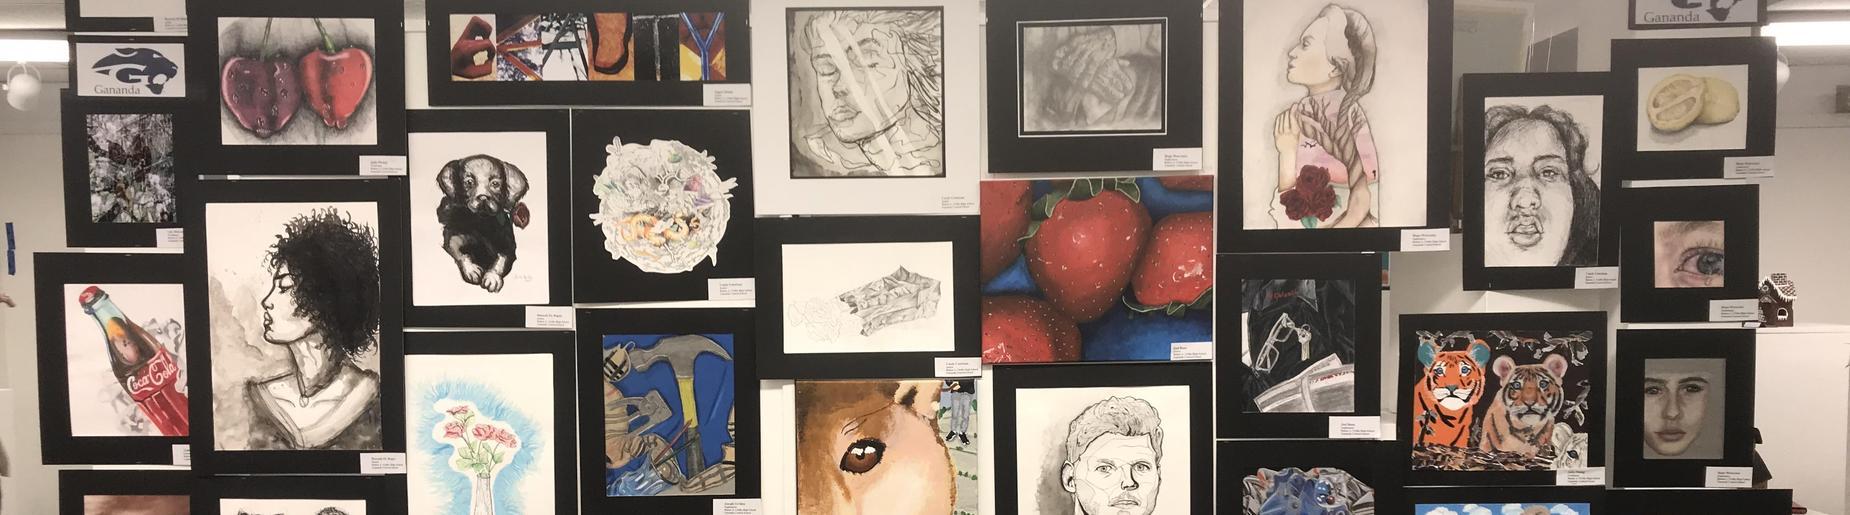 student's artwork on display